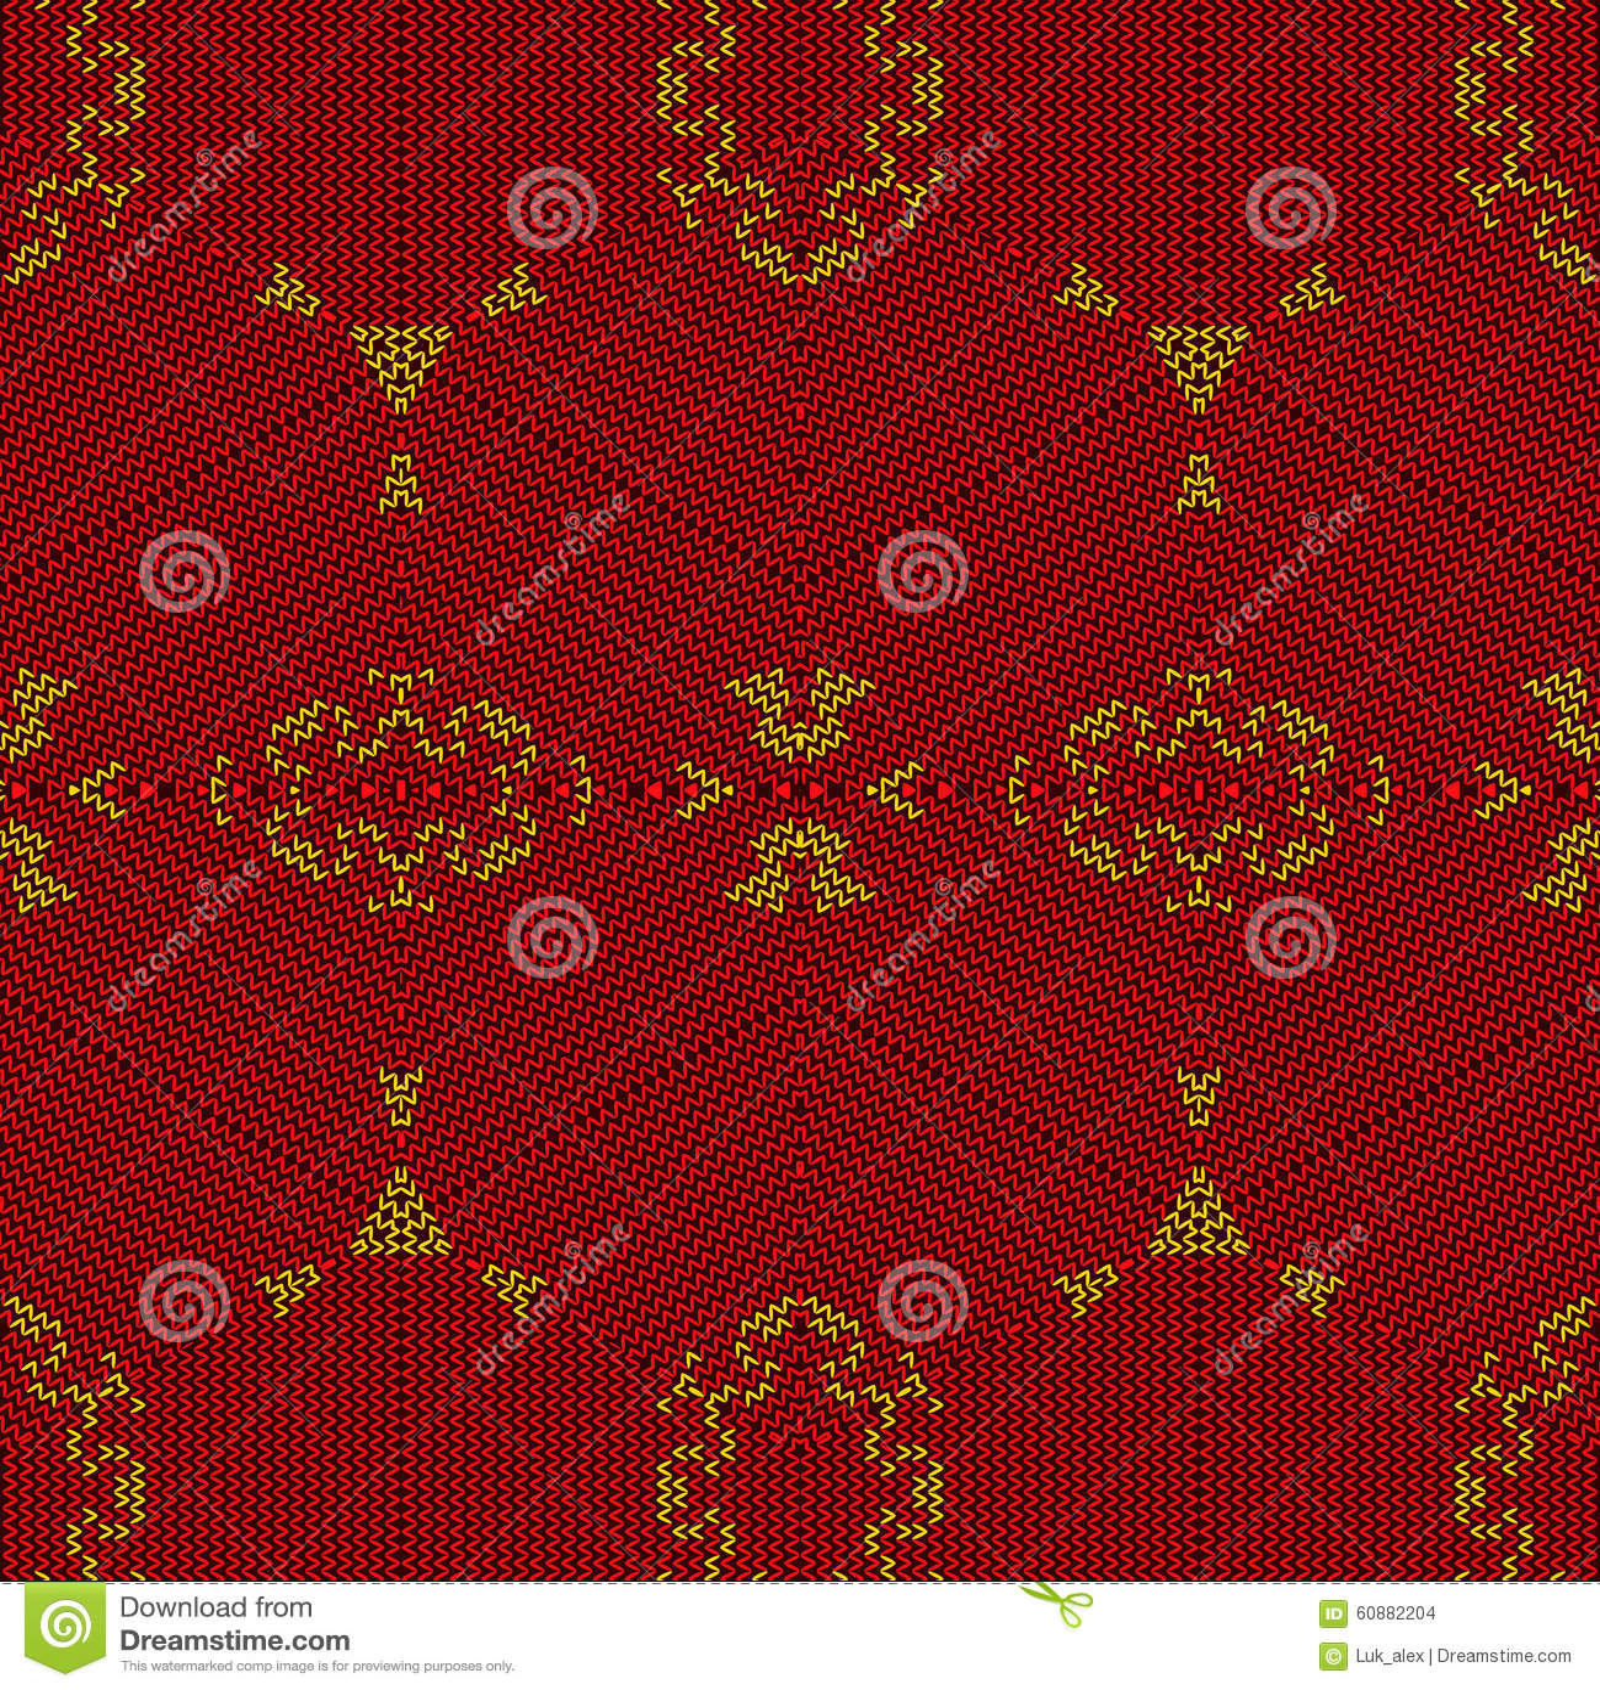 Knitting Pattern Stock Vector - Image: 60882204